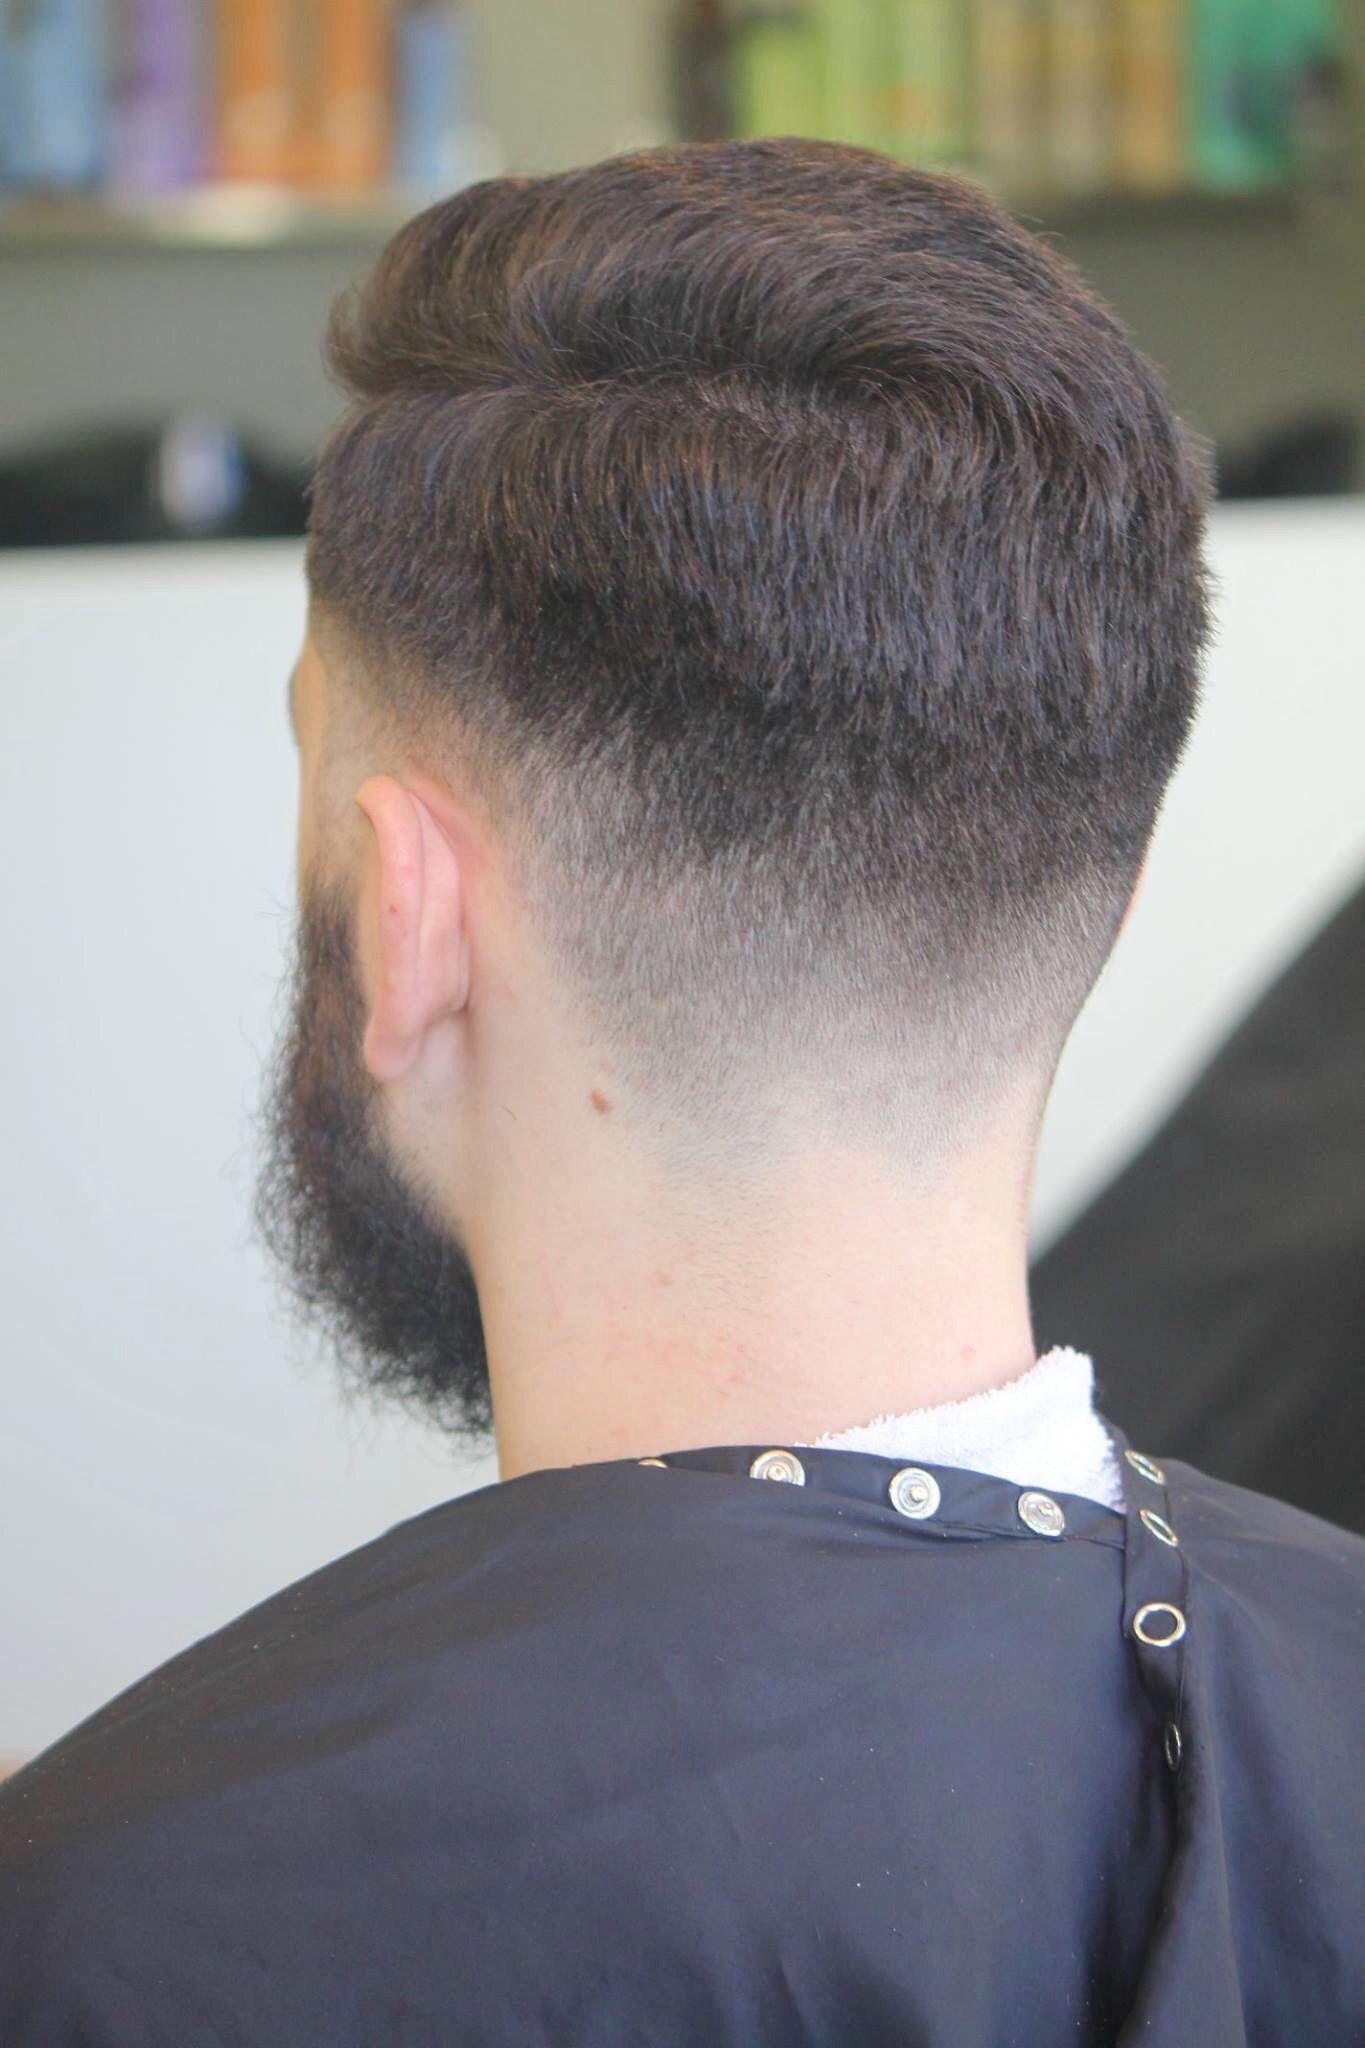 Fade Hairstylist Styliste Barber Haircut Men Homme Boucherville Qc Leloftespacecoiffure Hair Stylist Coiffure Hair